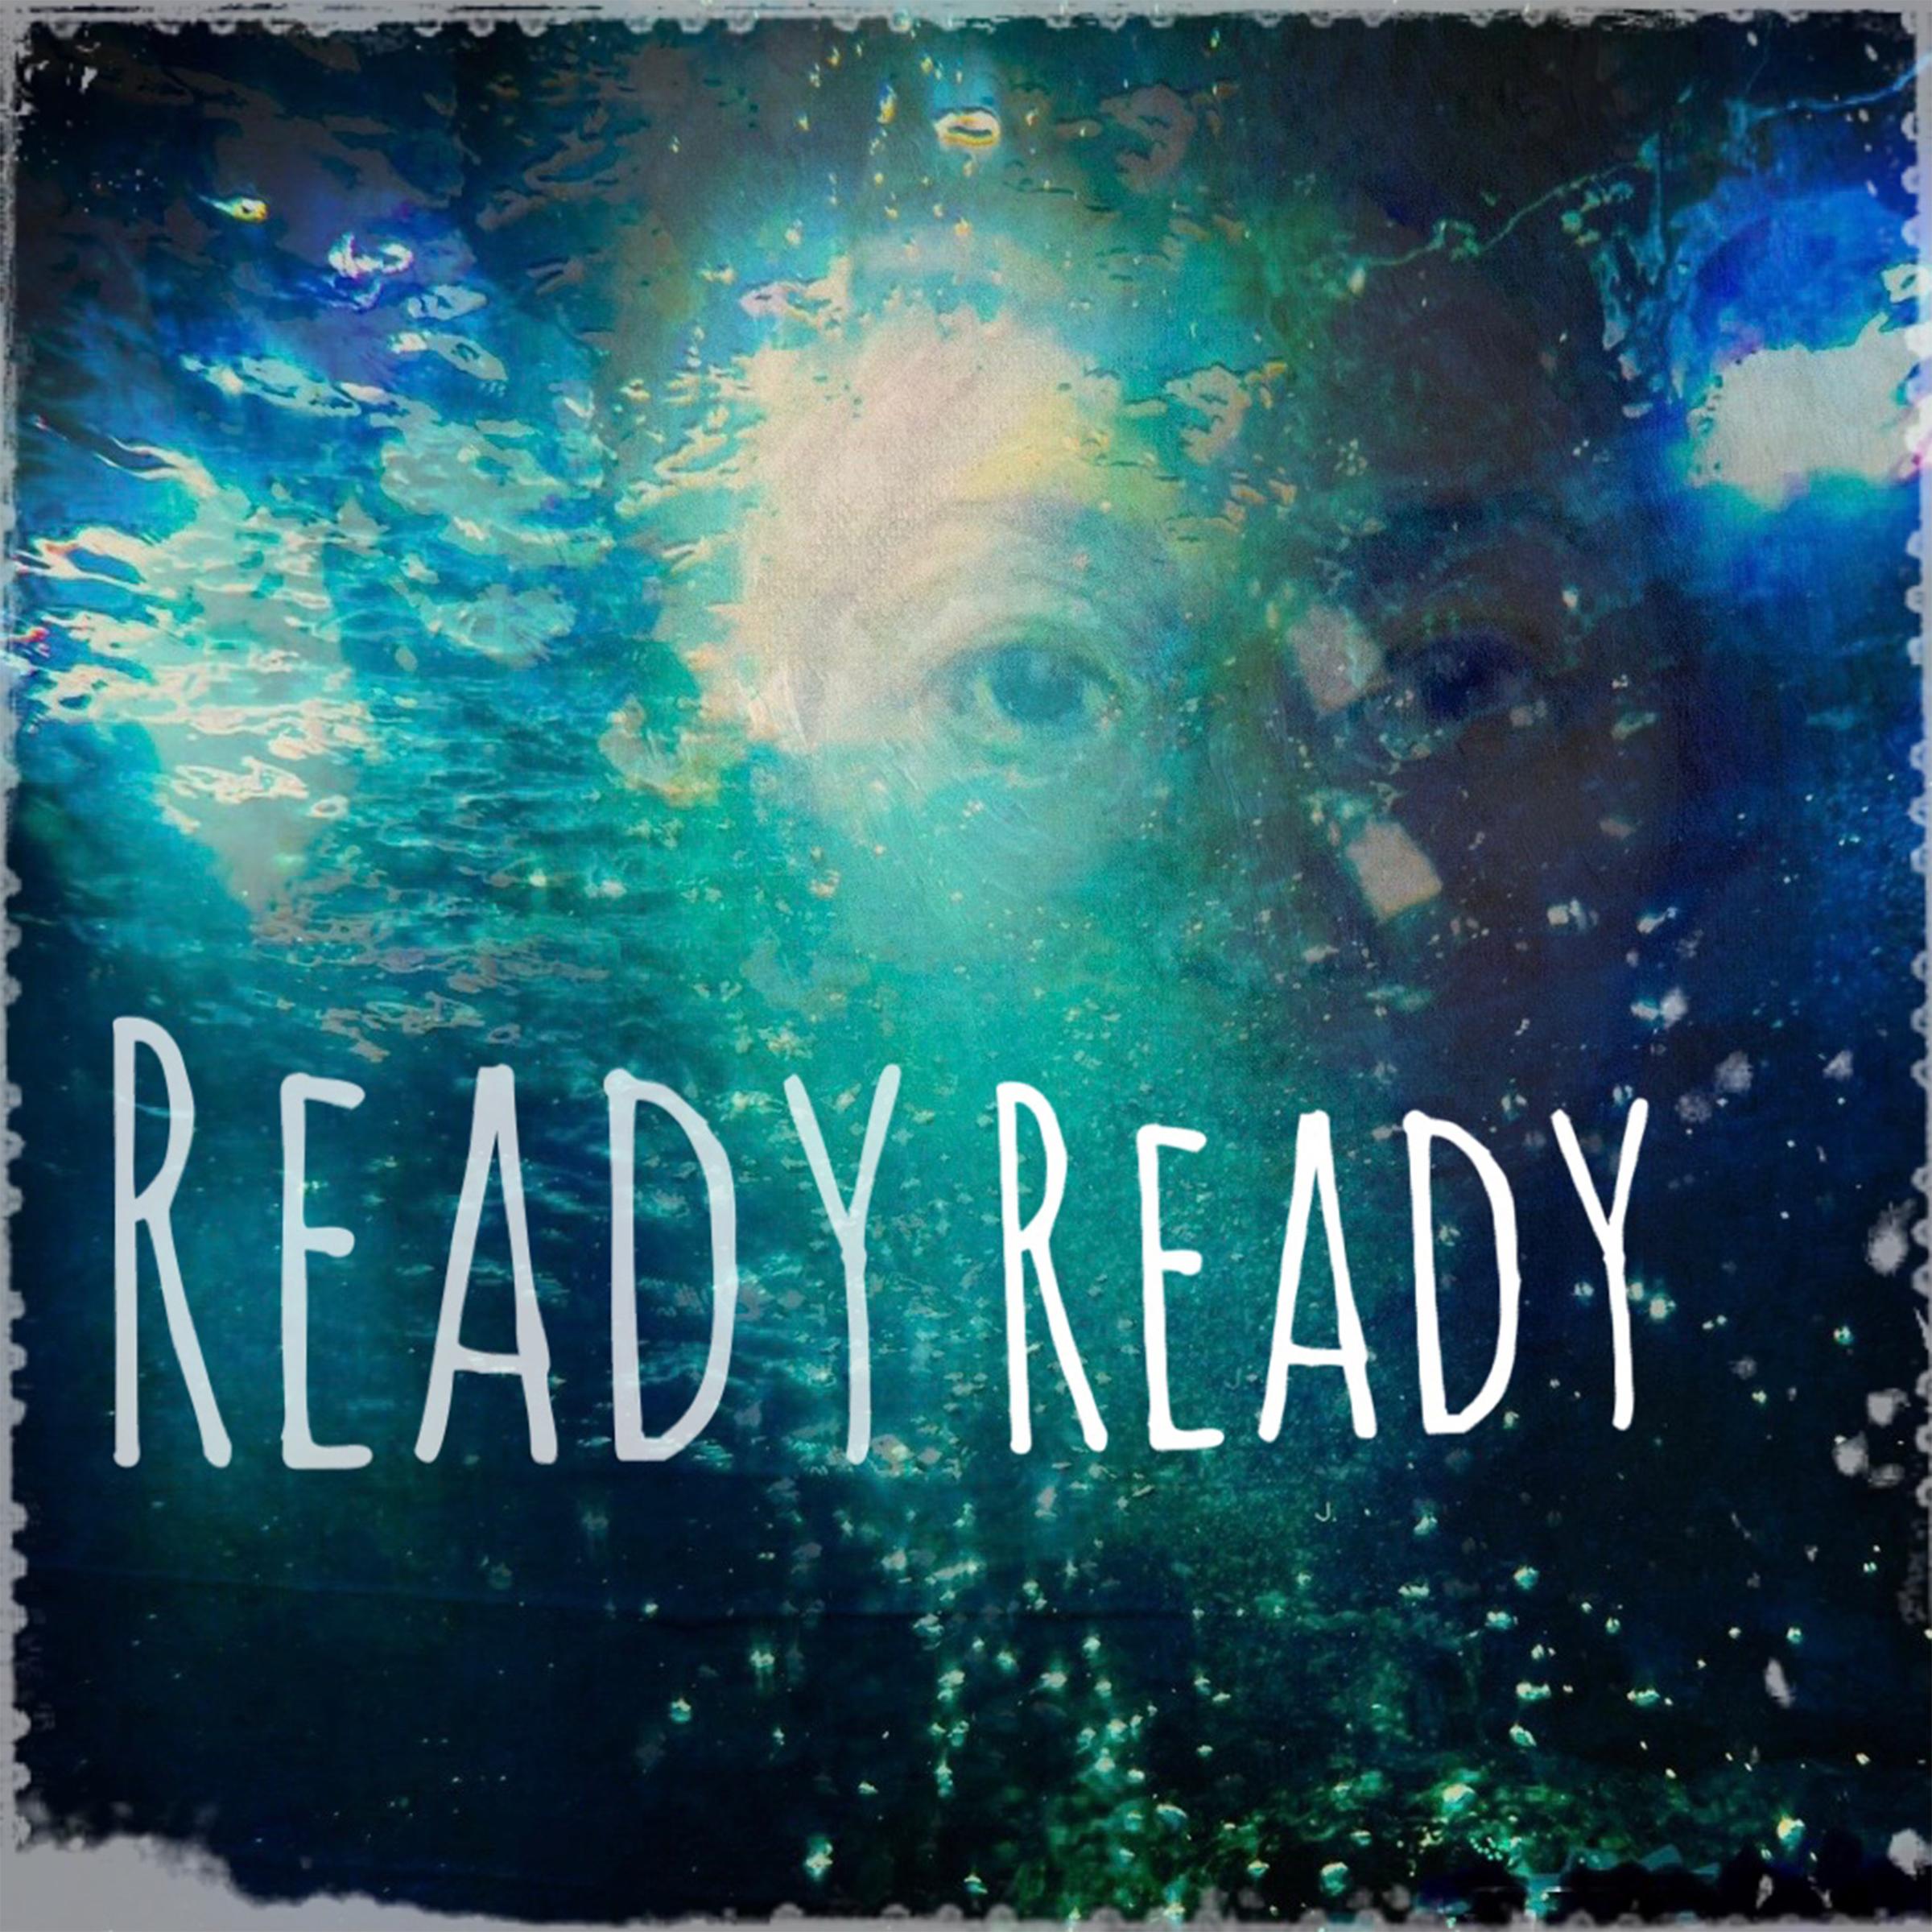 Ready_ready_jk